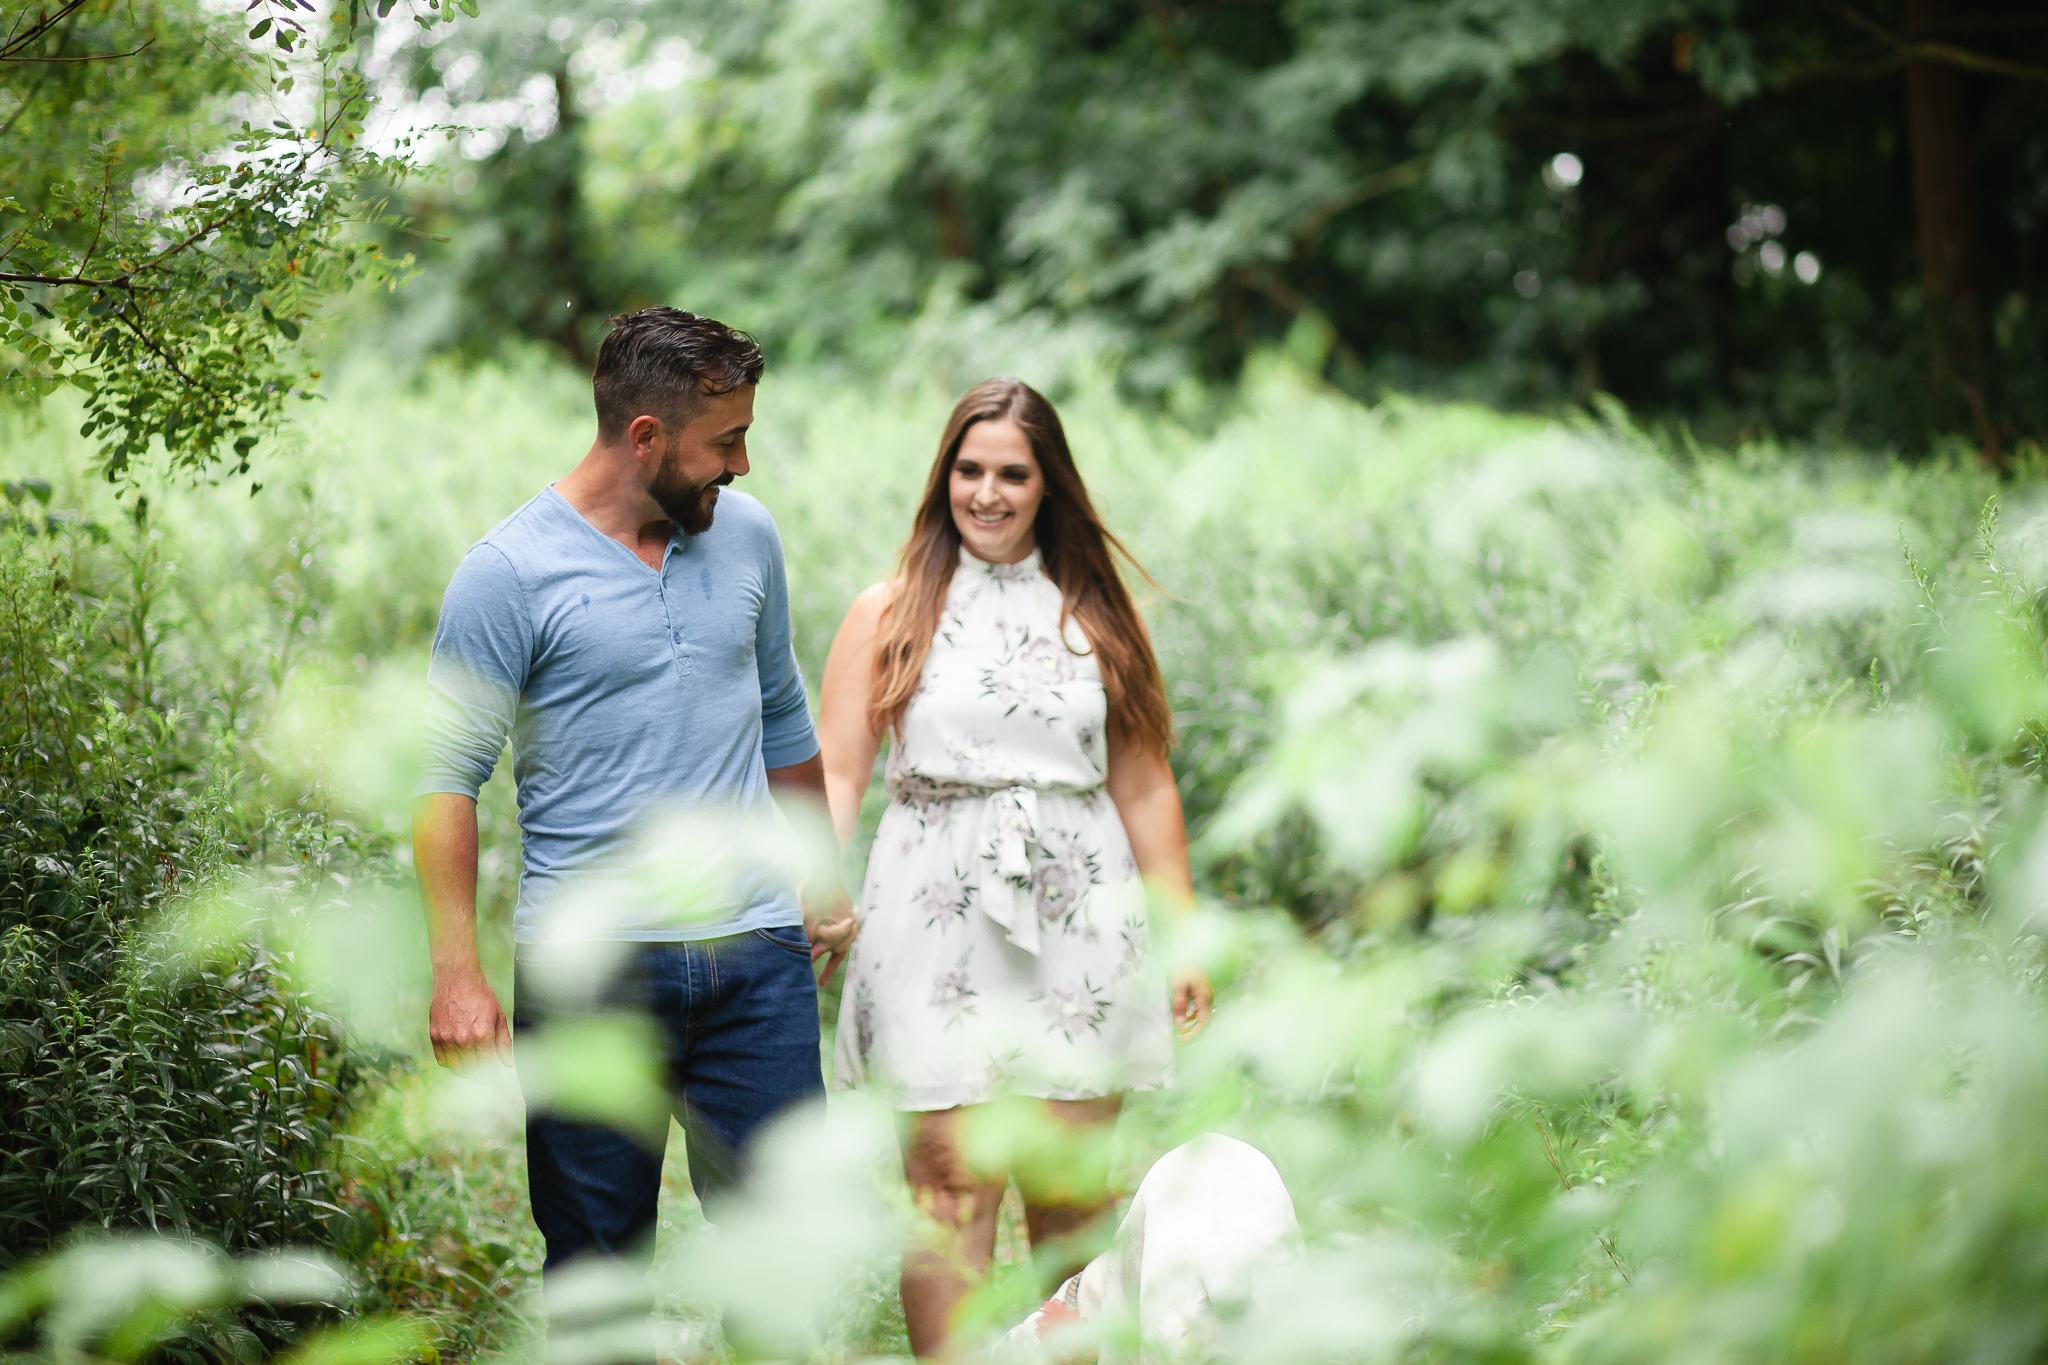 Amy D Photography- Barrie Wedding Photography- Barrie Wedding Photography- Engagement Session- Engagement Photography- Engagement Session Ideas- Wedding Photography-37.jpg